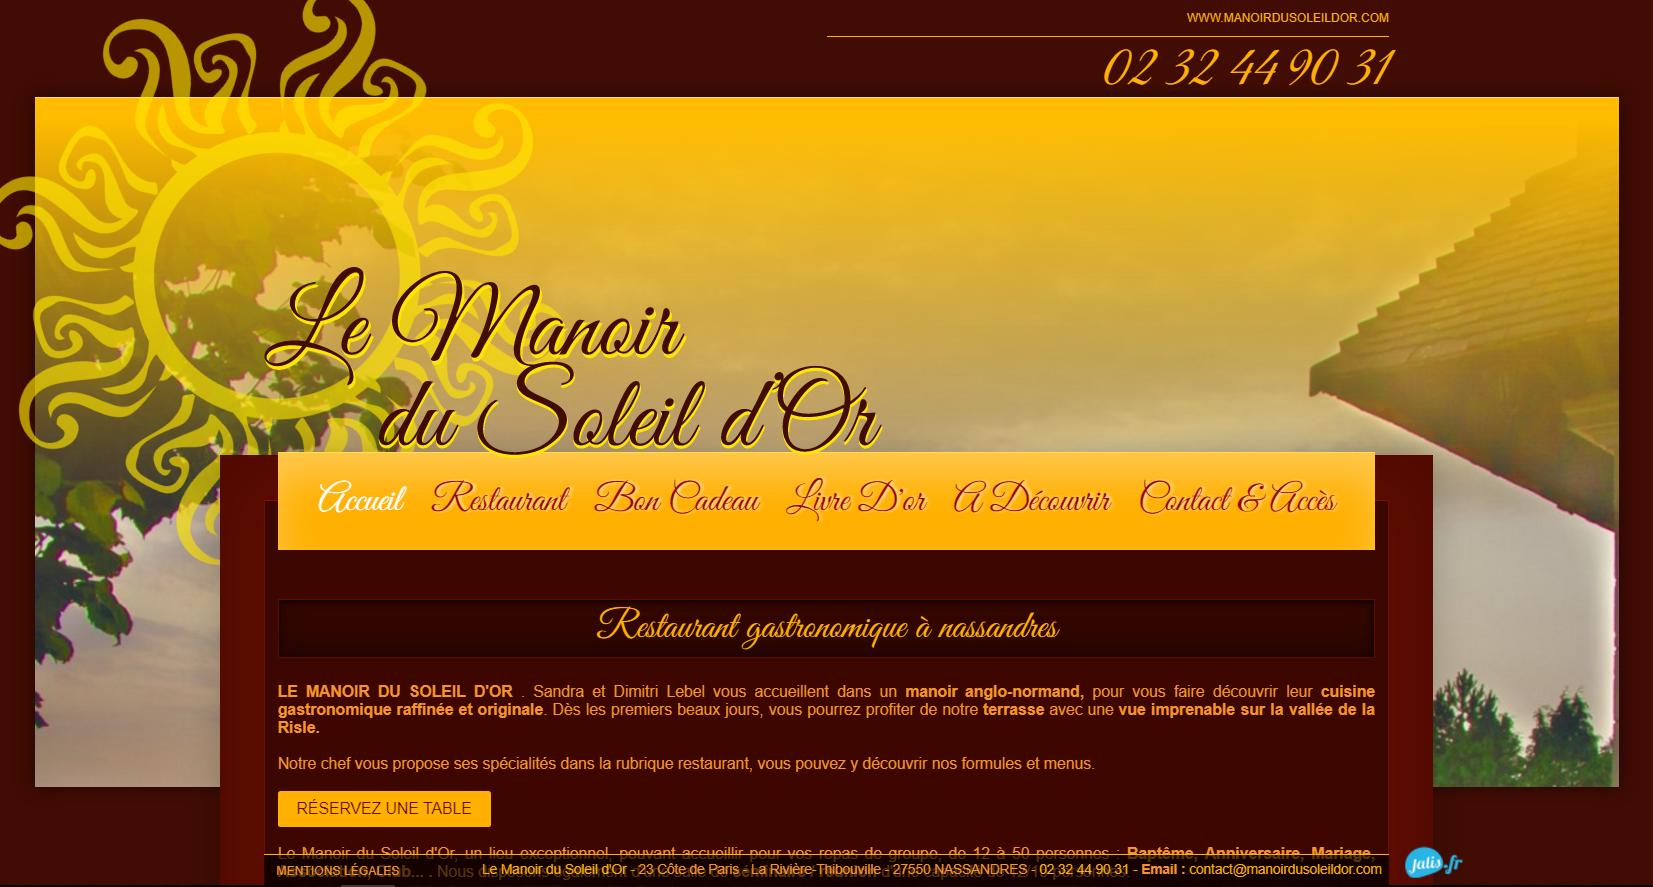 MANOIR DU SOLEIL D'OR restaurant